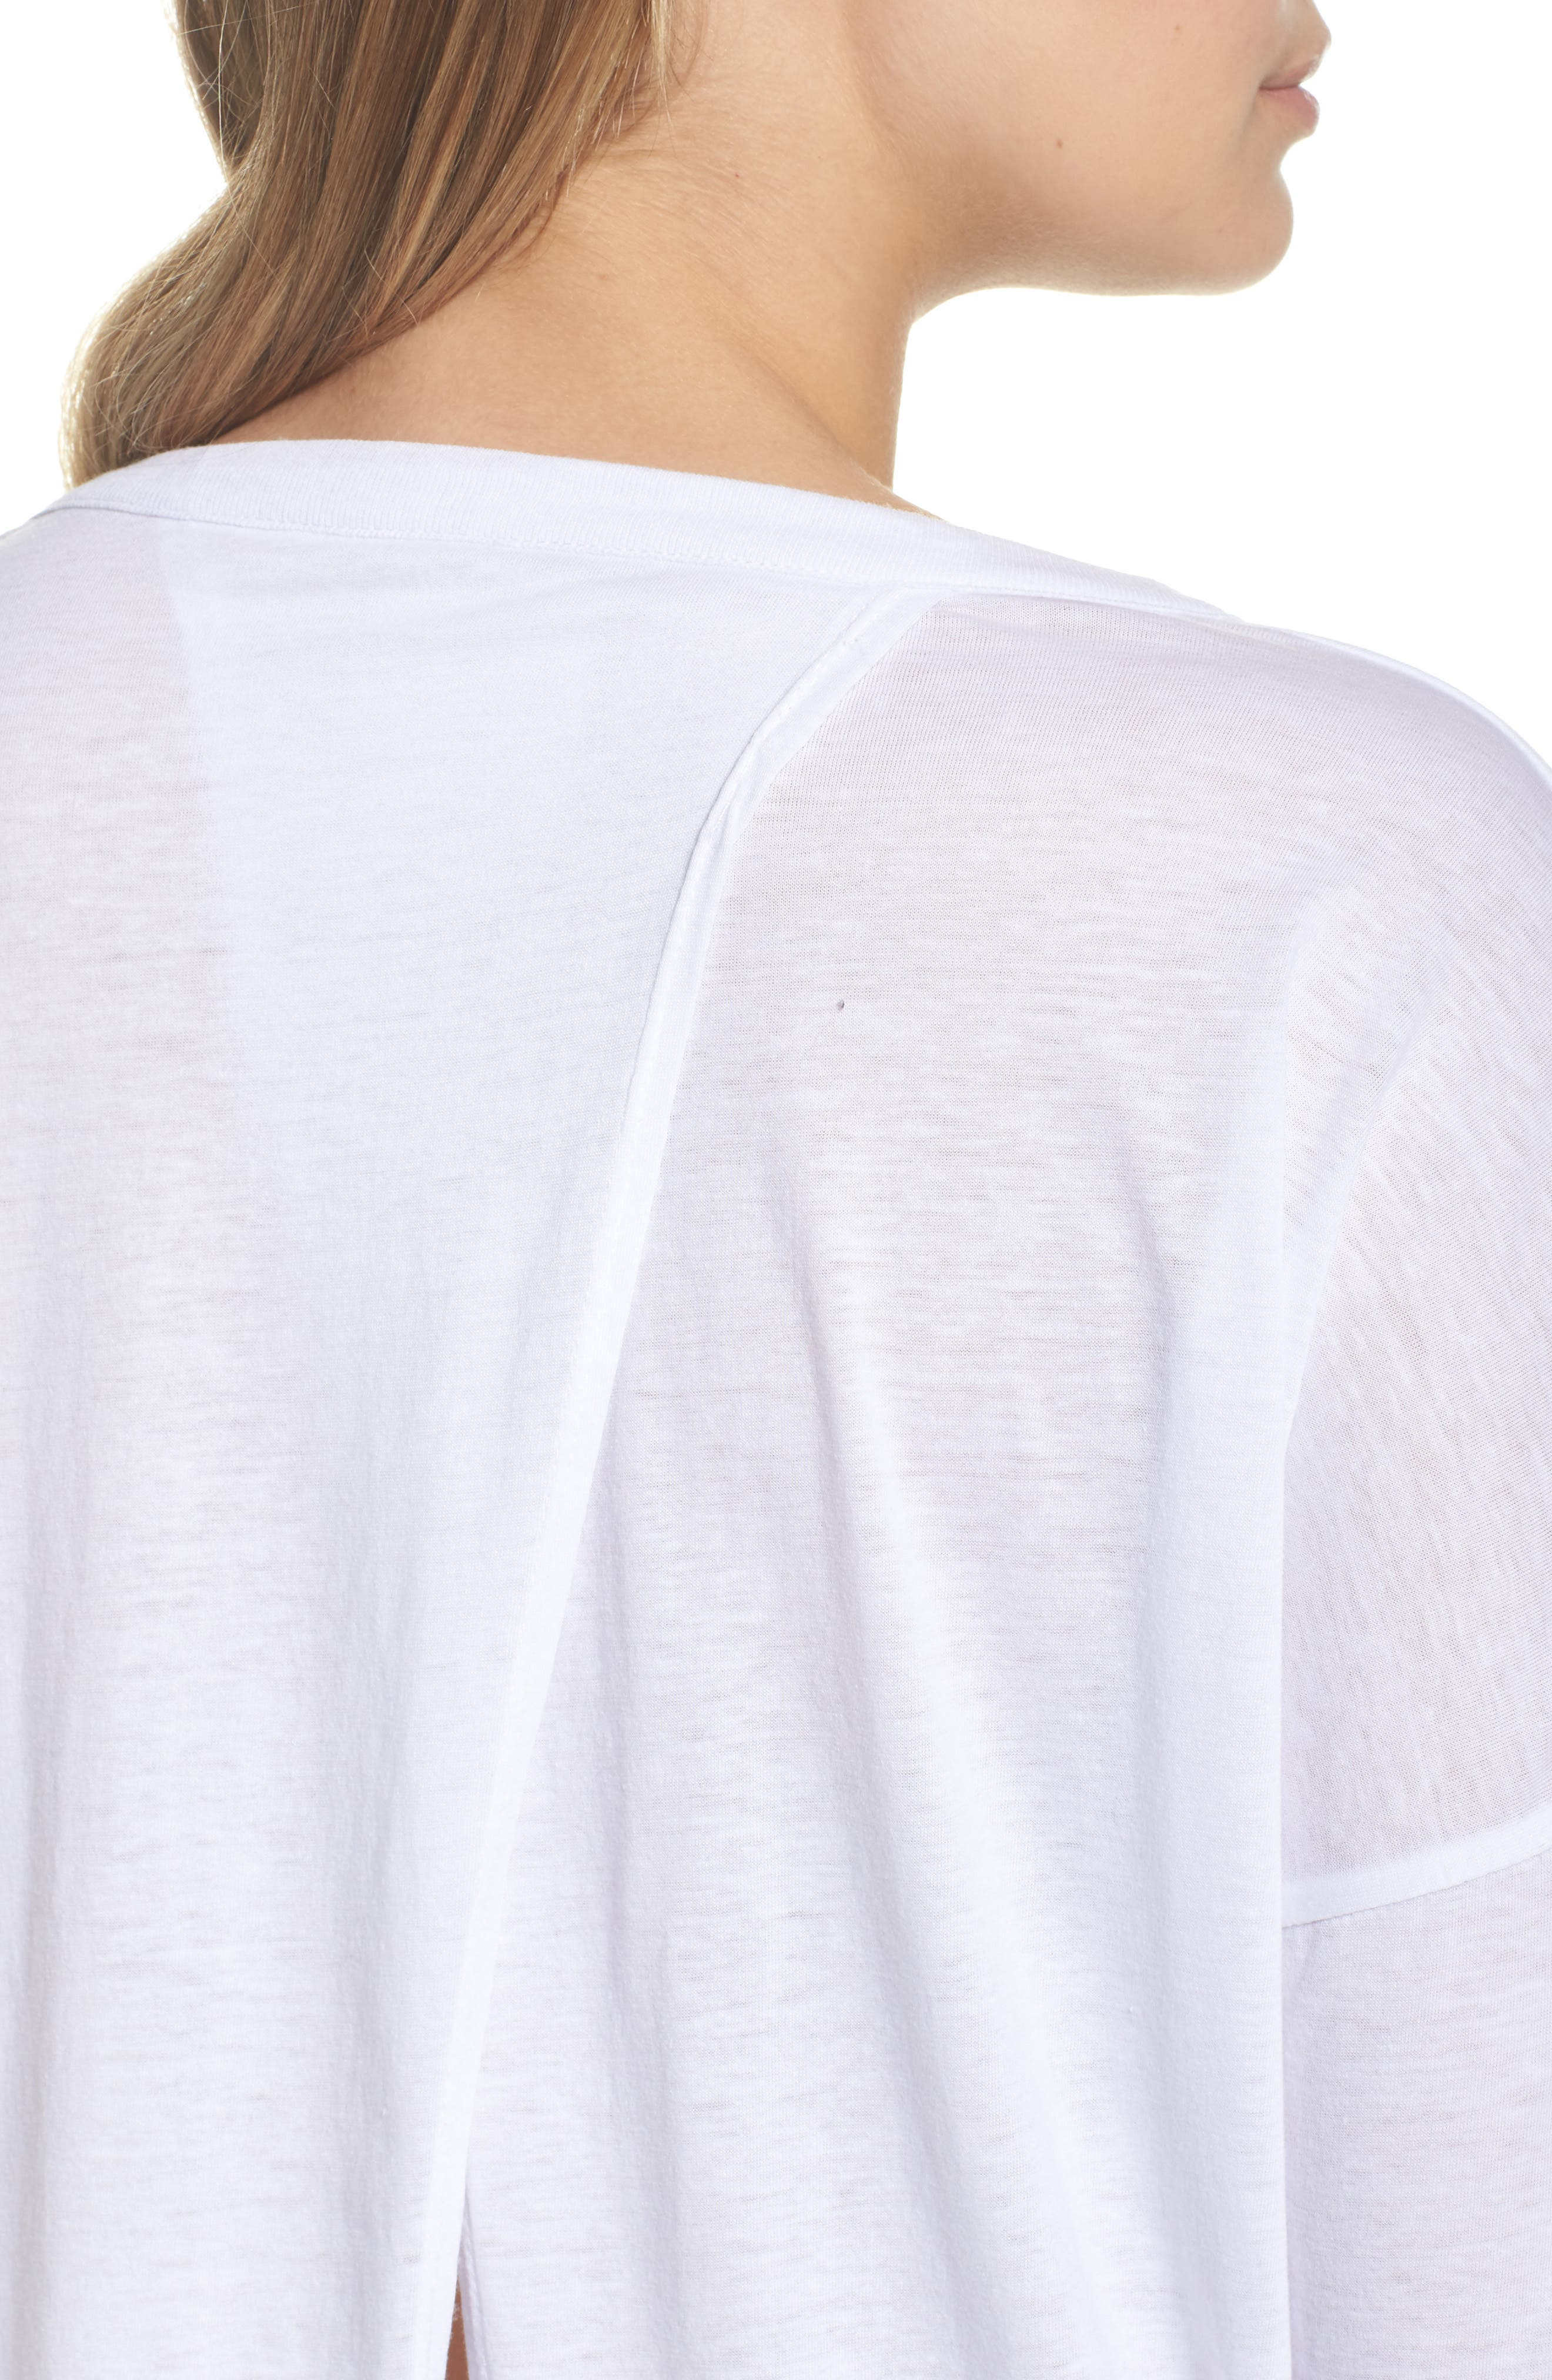 Vintage Jersey Split Back Tee,                             Alternate thumbnail 5, color,                             White